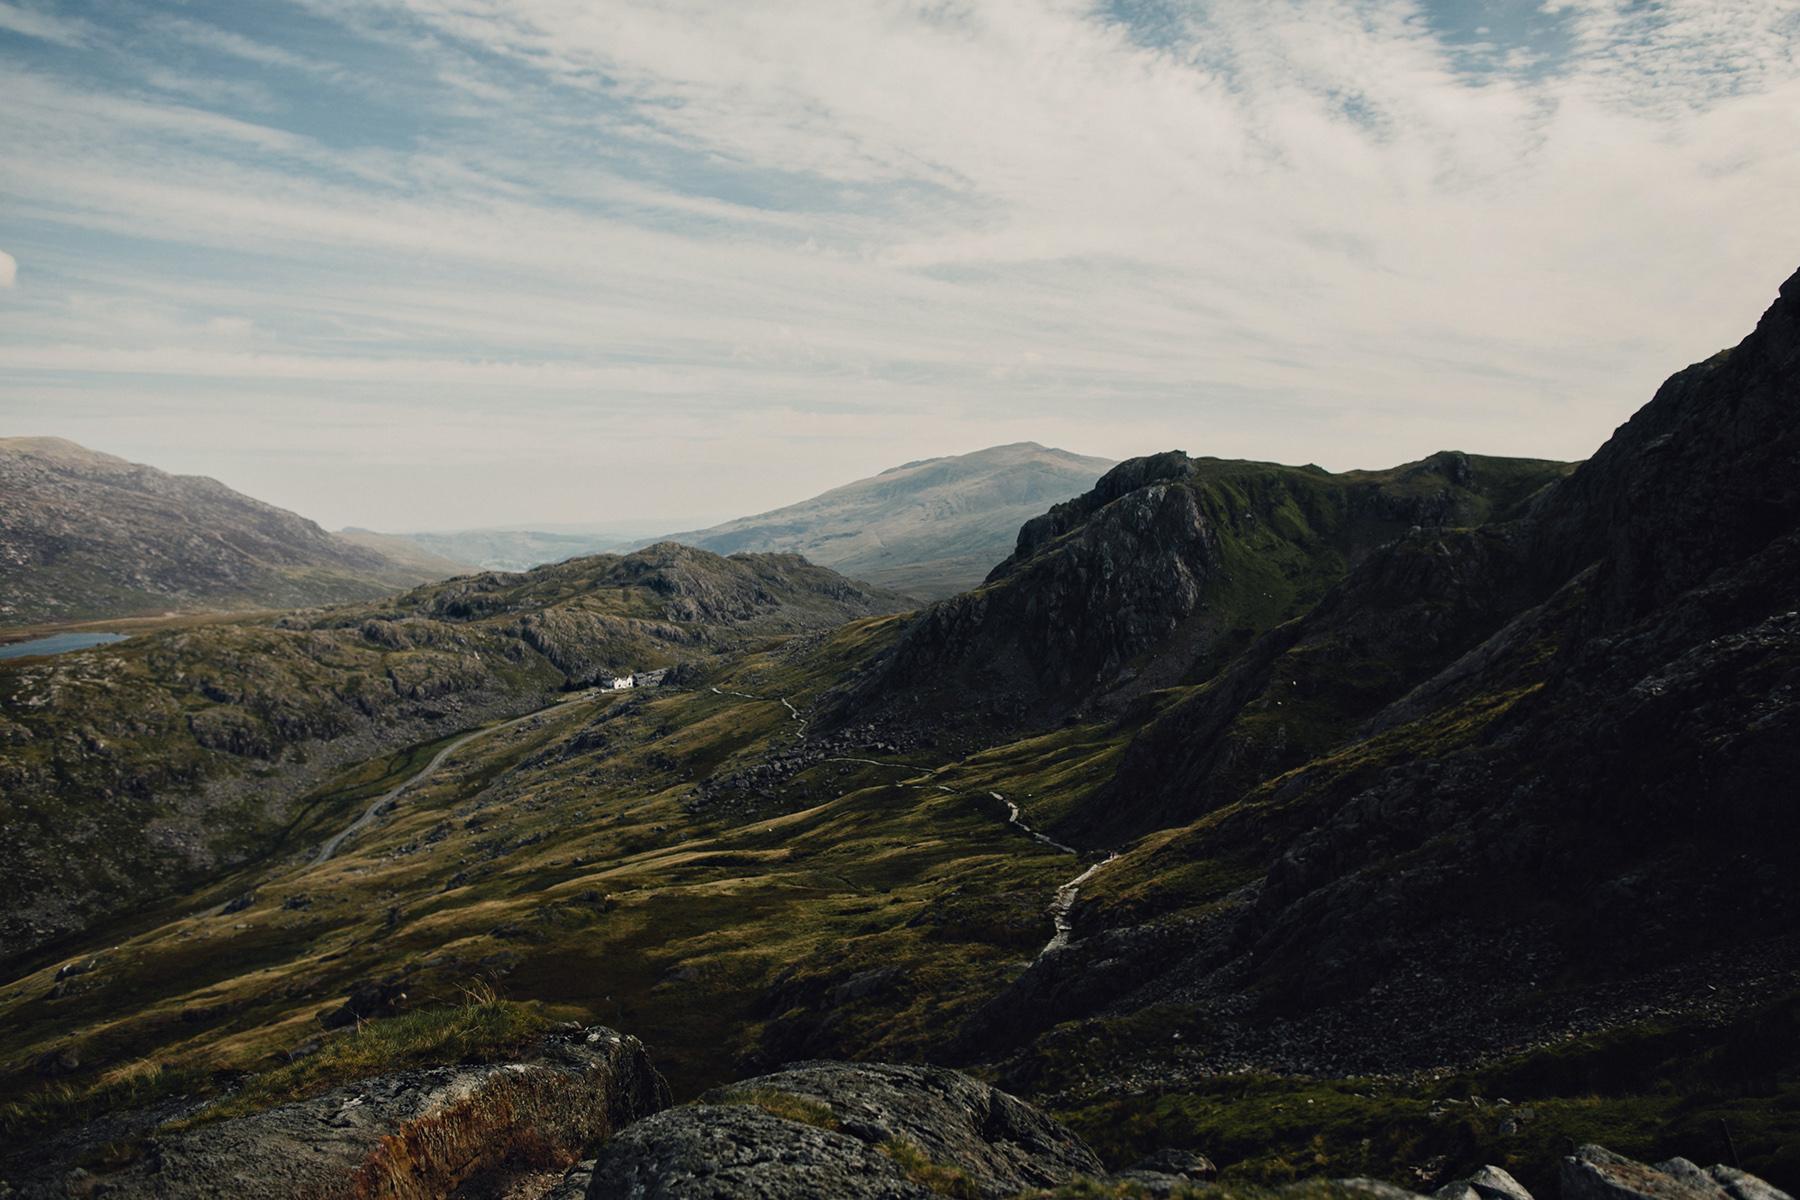 Mt-Snowdon-Hike-Photos-From-Peny-Pass-00051.jpg